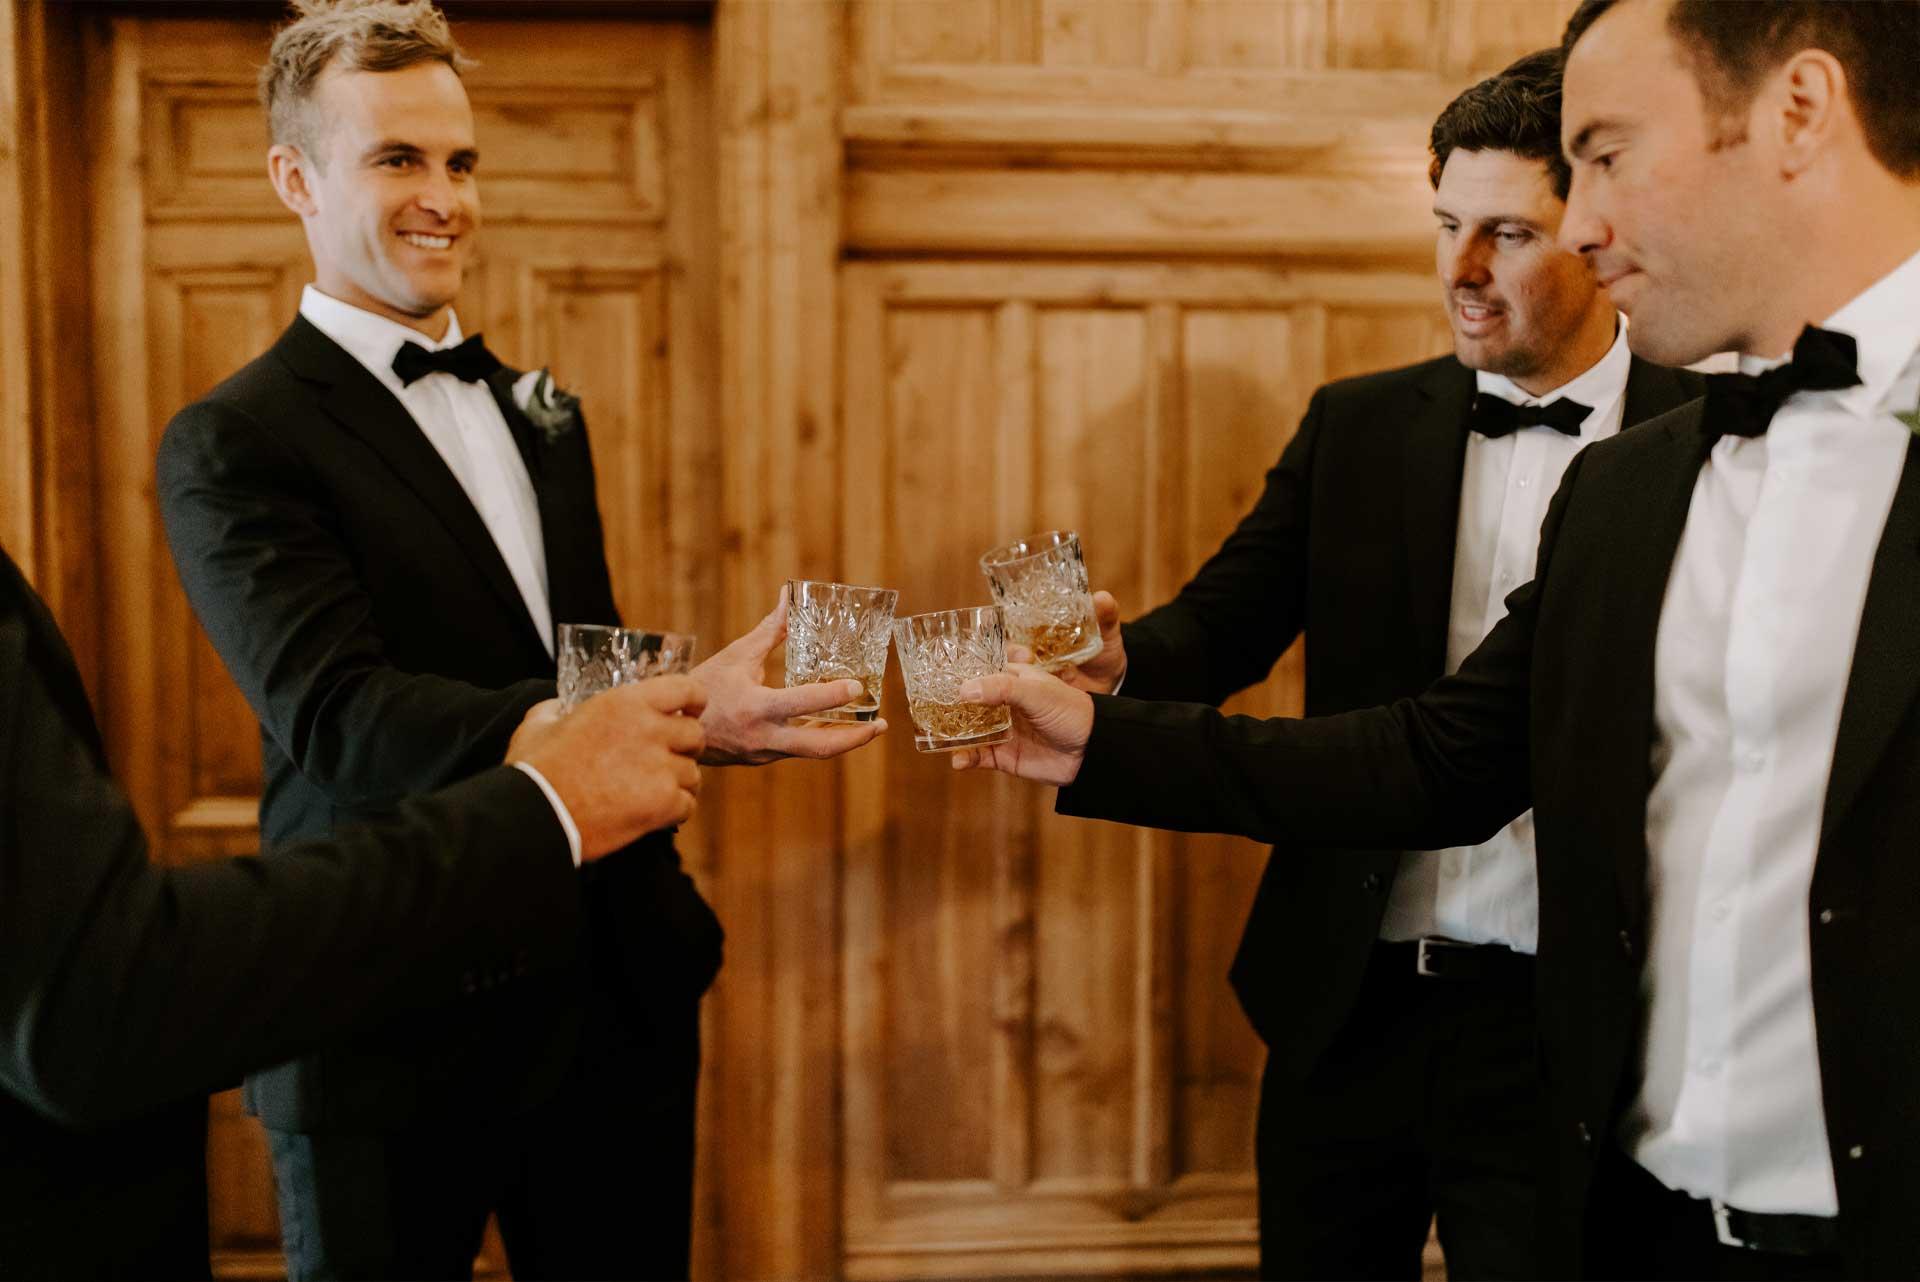 silk-estate-marquee-weddings-and-events-blog-katie-scott-14